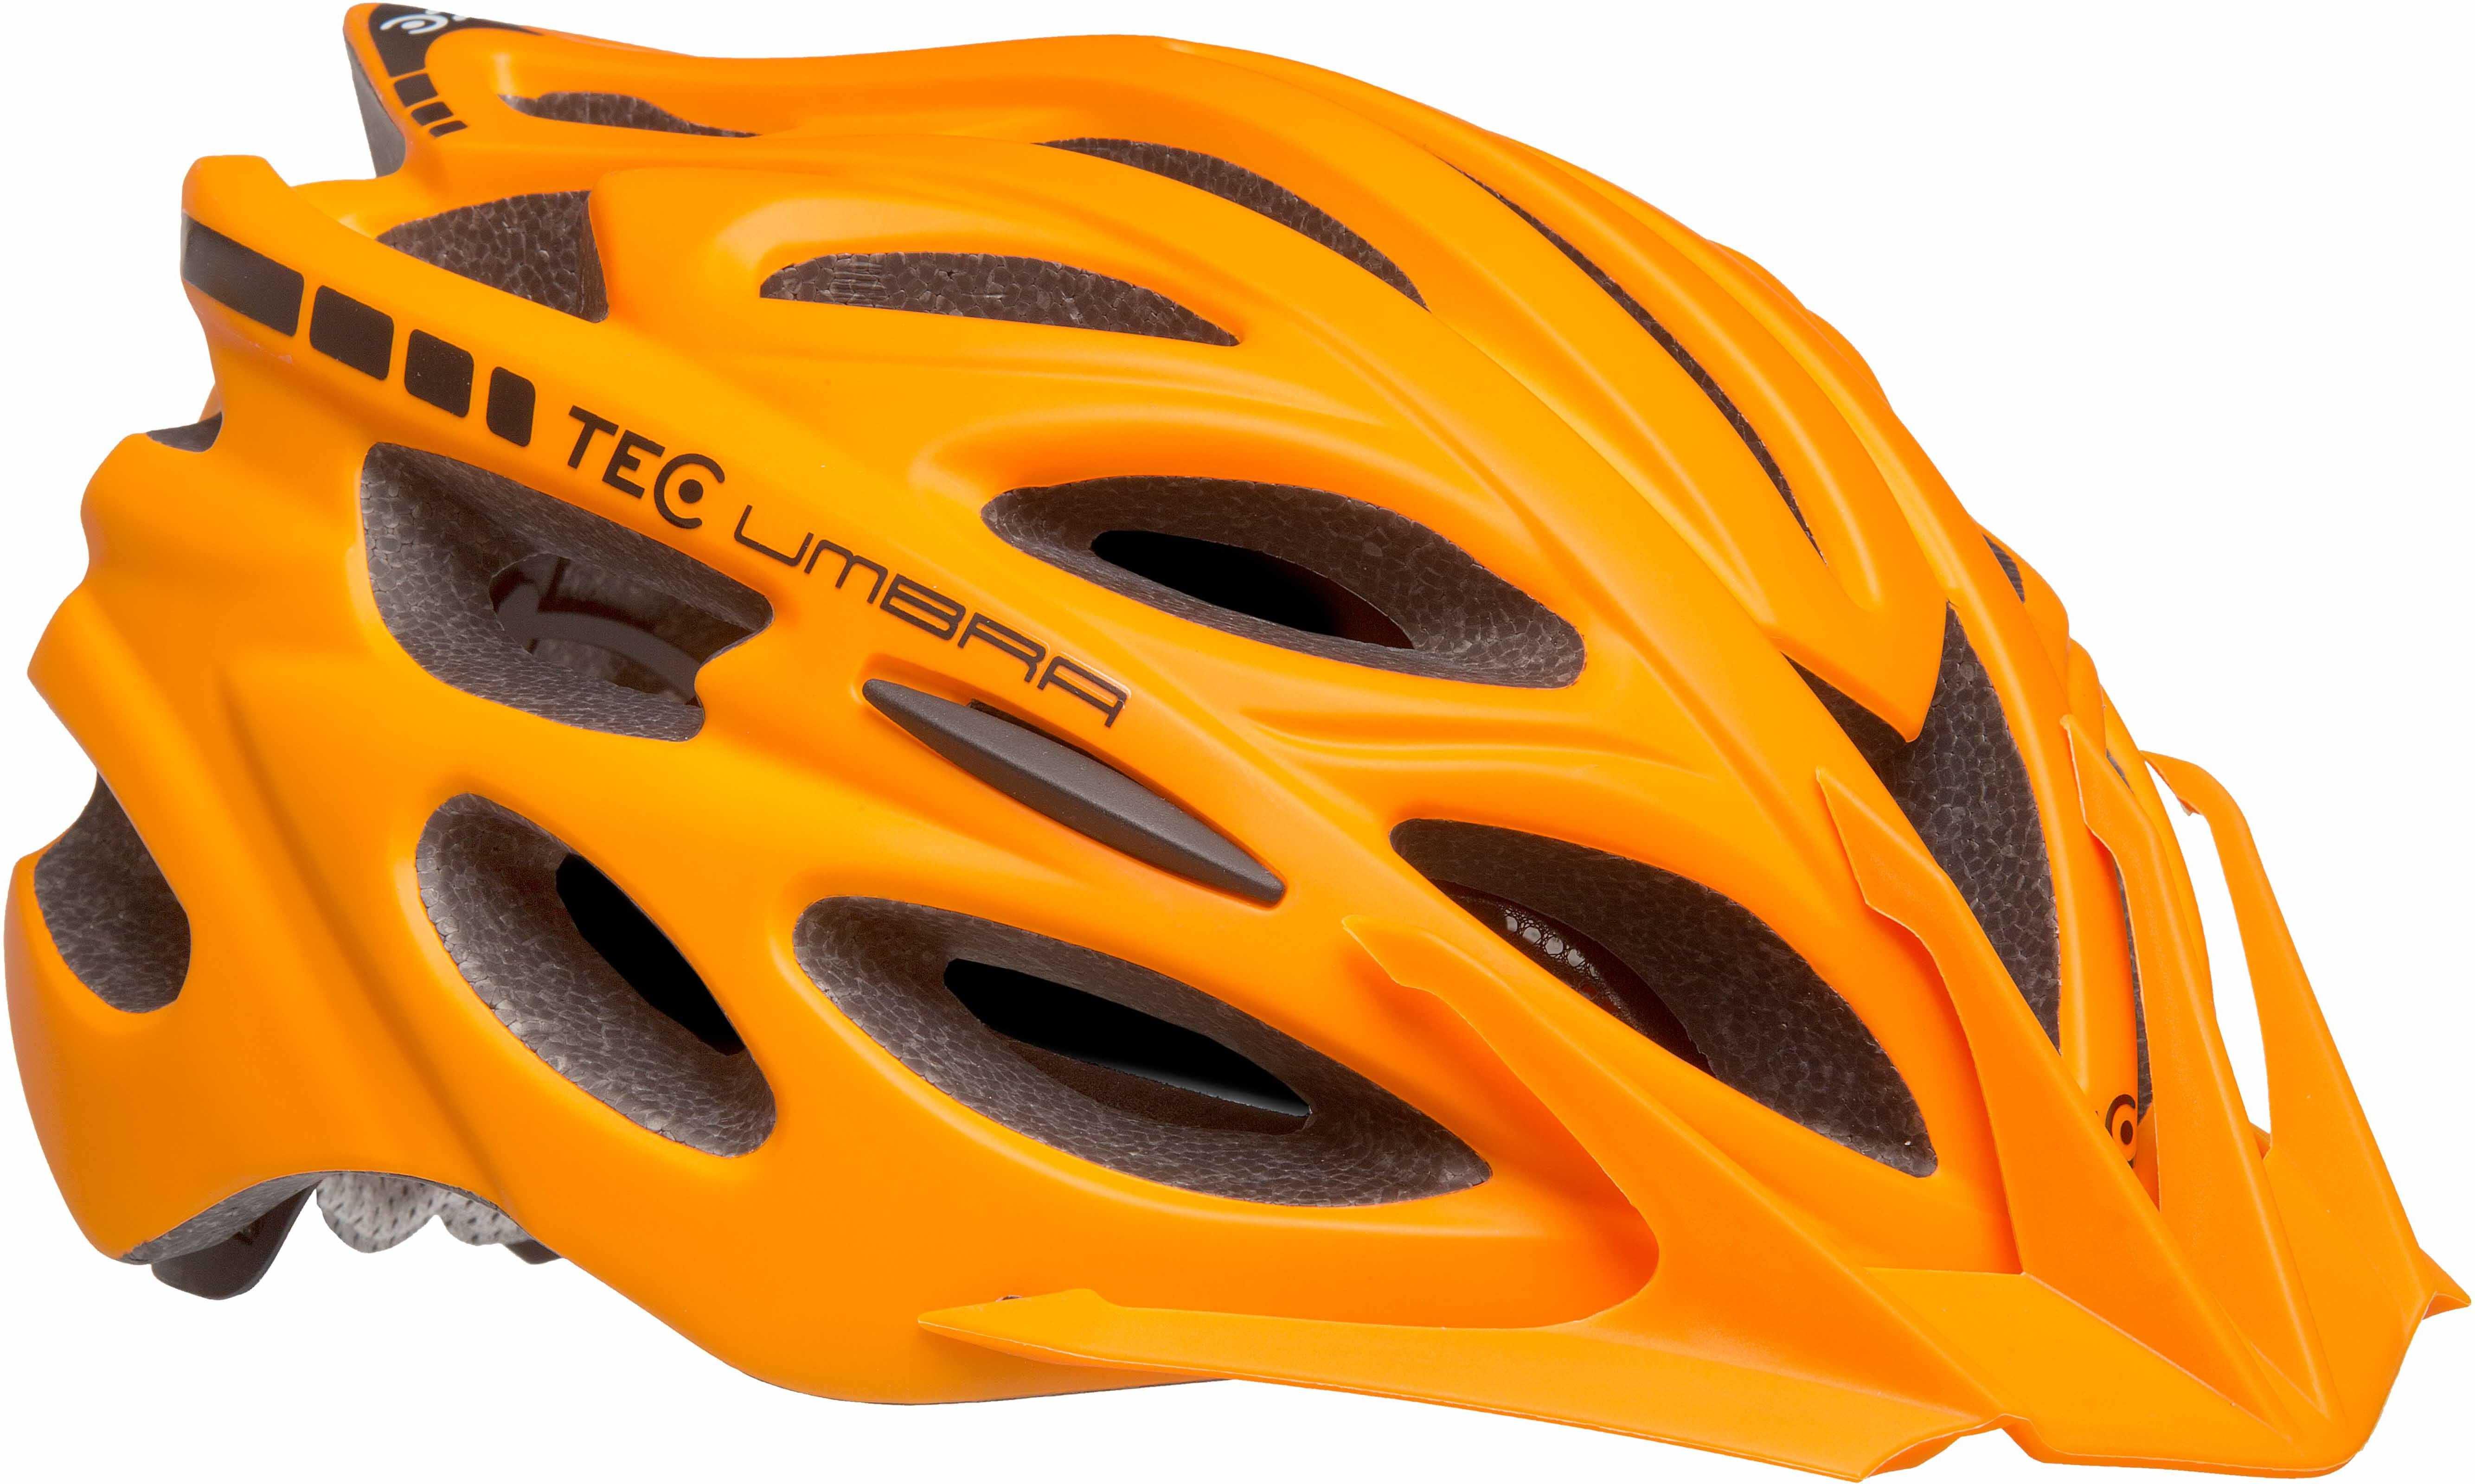 Hjelm TEC Umbra EV1 MIPS orange | Hjelme